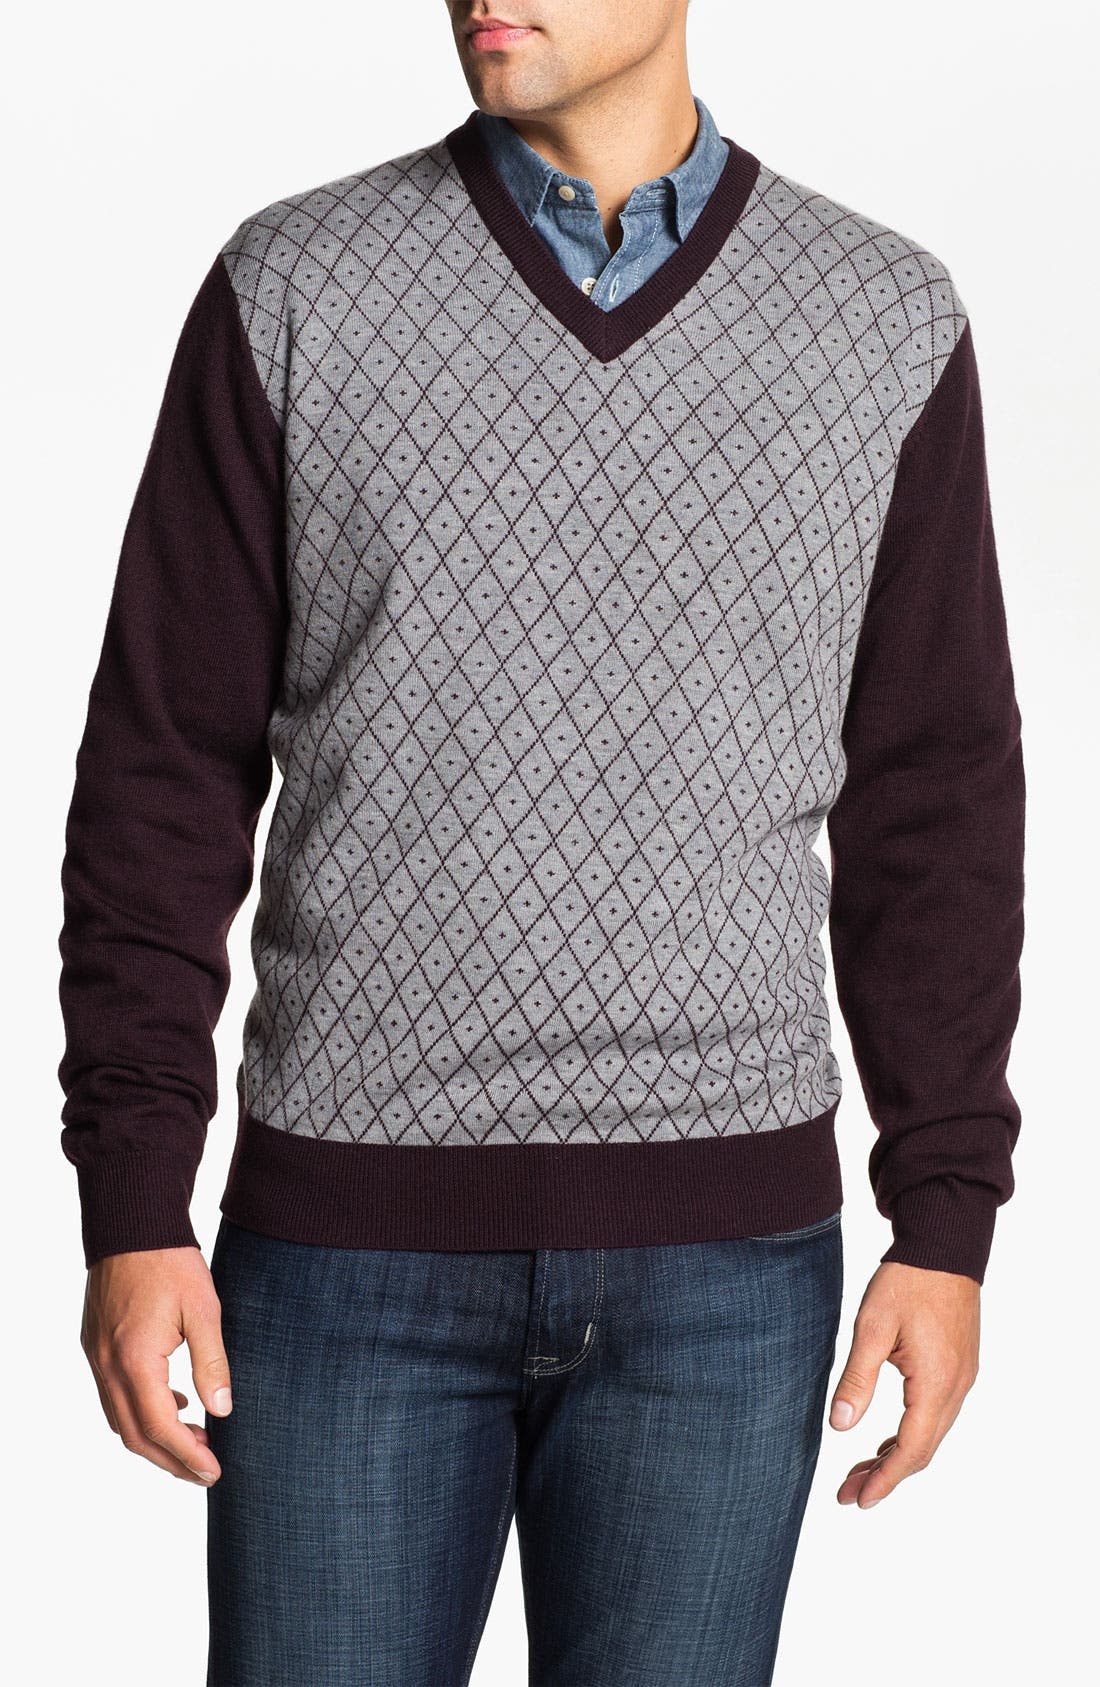 Alternate Image 1 Selected - Toscano Merino Wool Blend V-Neck Sweater